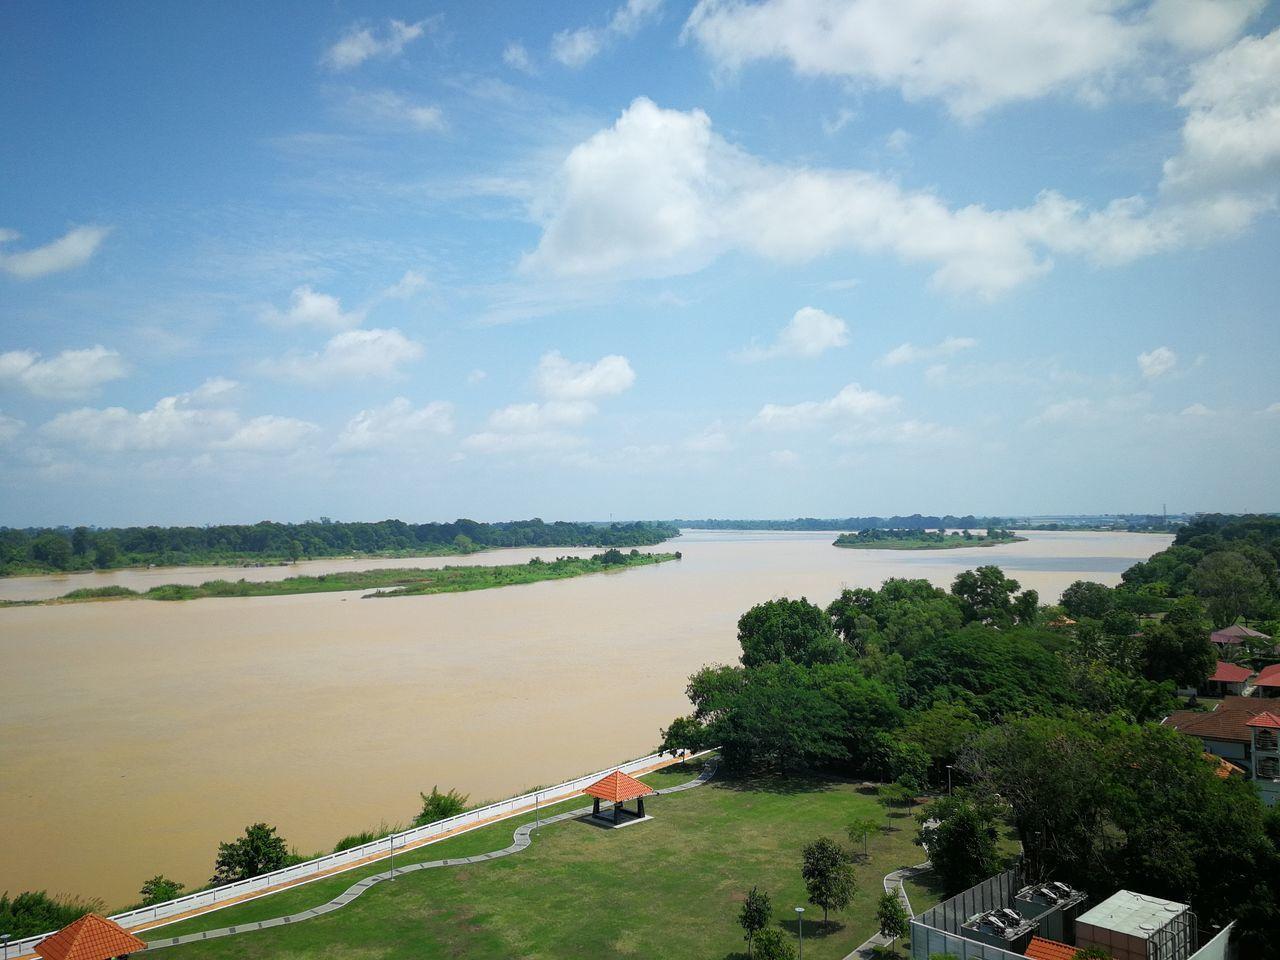 Pahang River Pahang, Malaysia Pahang River View Scenary Mobile Photography Clouds Sky Blue Sky River River Bank  Water Freshwater